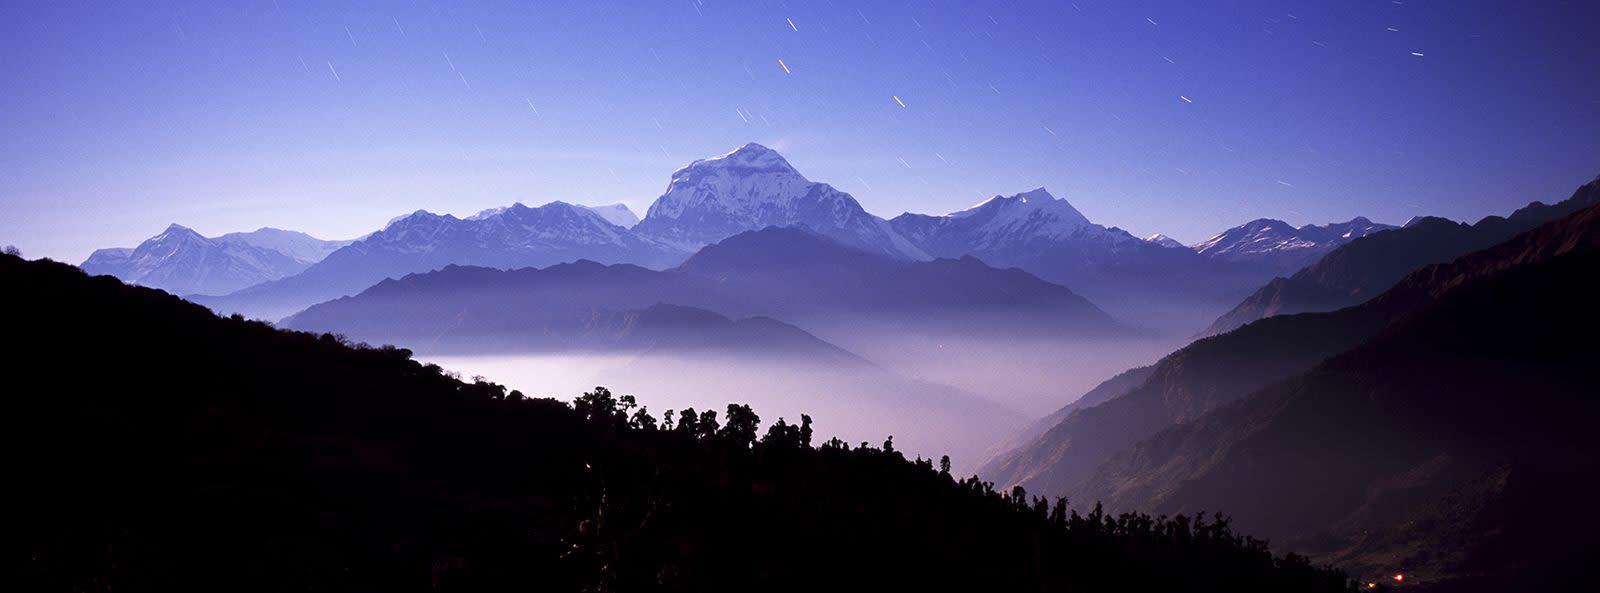 Matjaž Krivic, doulaghiri himalaya, nepal